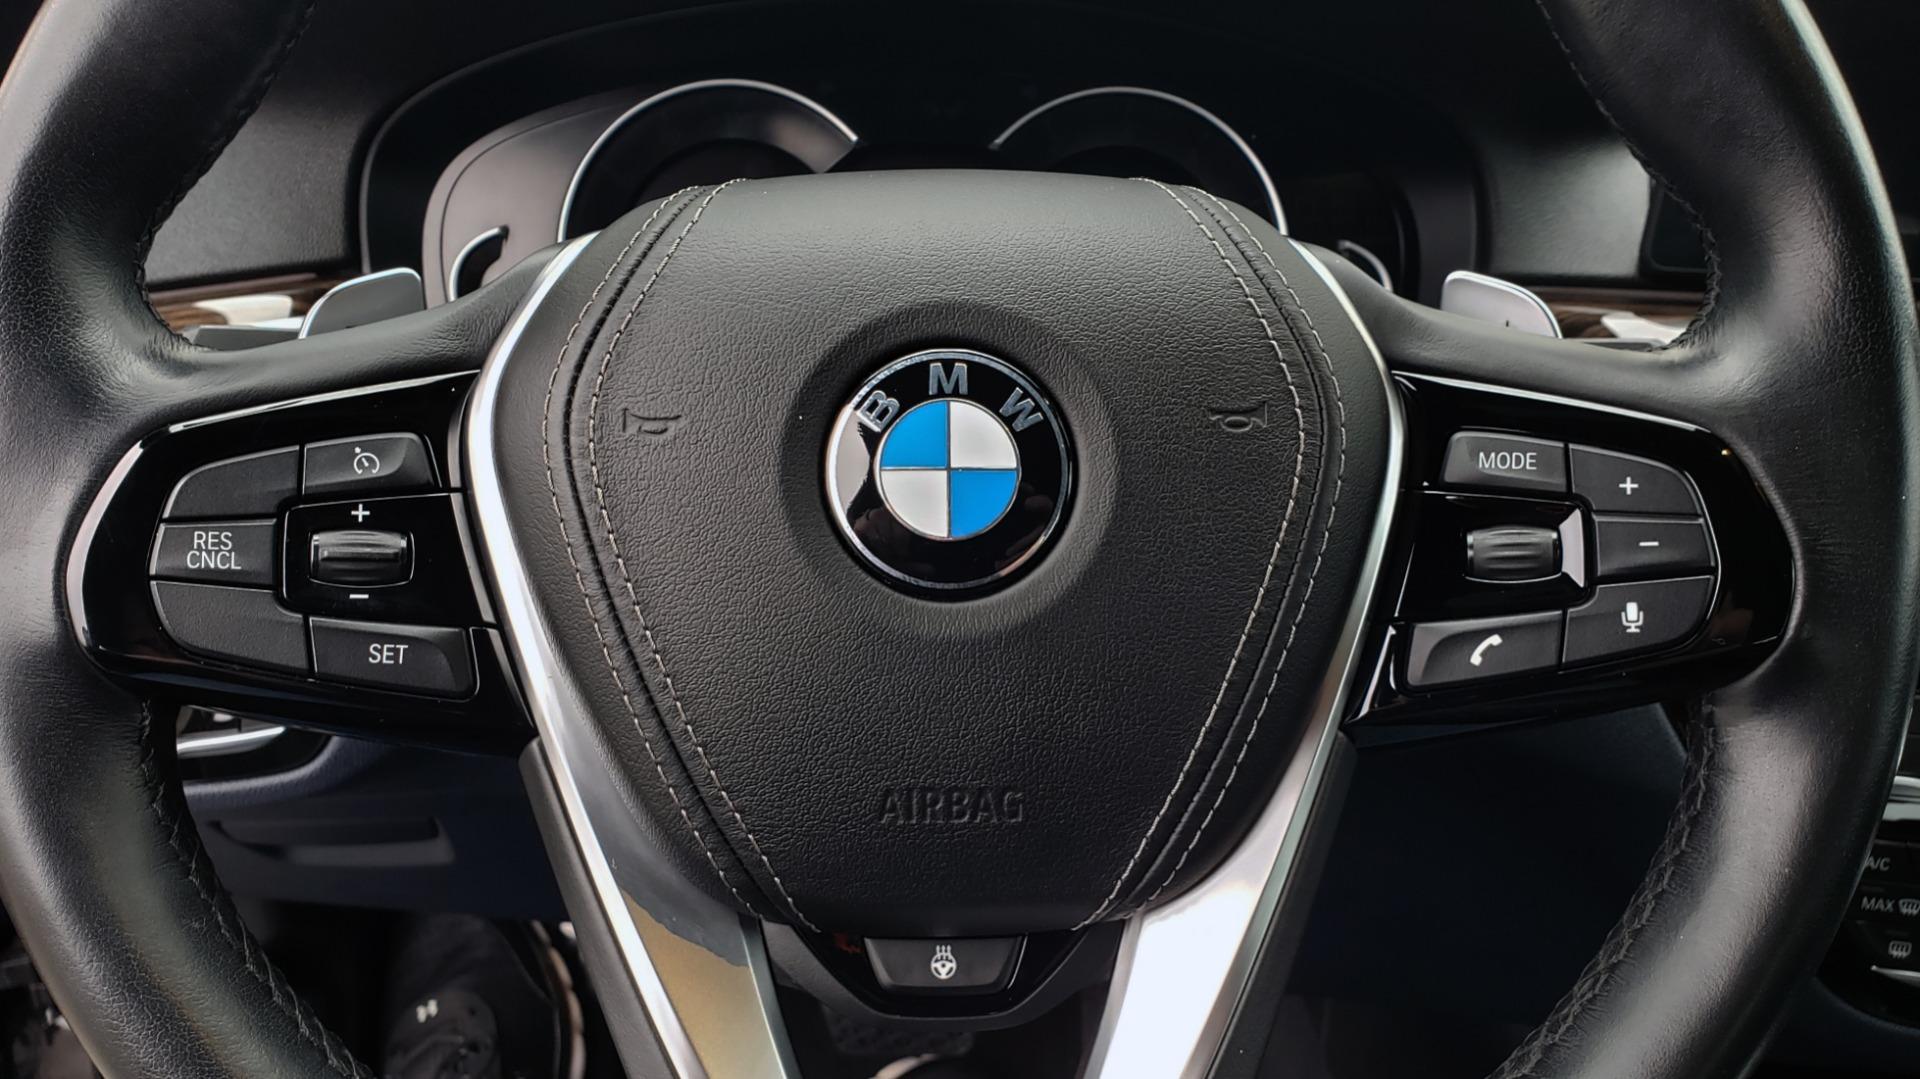 Used 2017 BMW 5 SERIES 530IXDRIVE / PREM PKG / DRVR ASST PLUS / CLD WTHR / APPLE CARPLAY for sale Sold at Formula Imports in Charlotte NC 28227 38